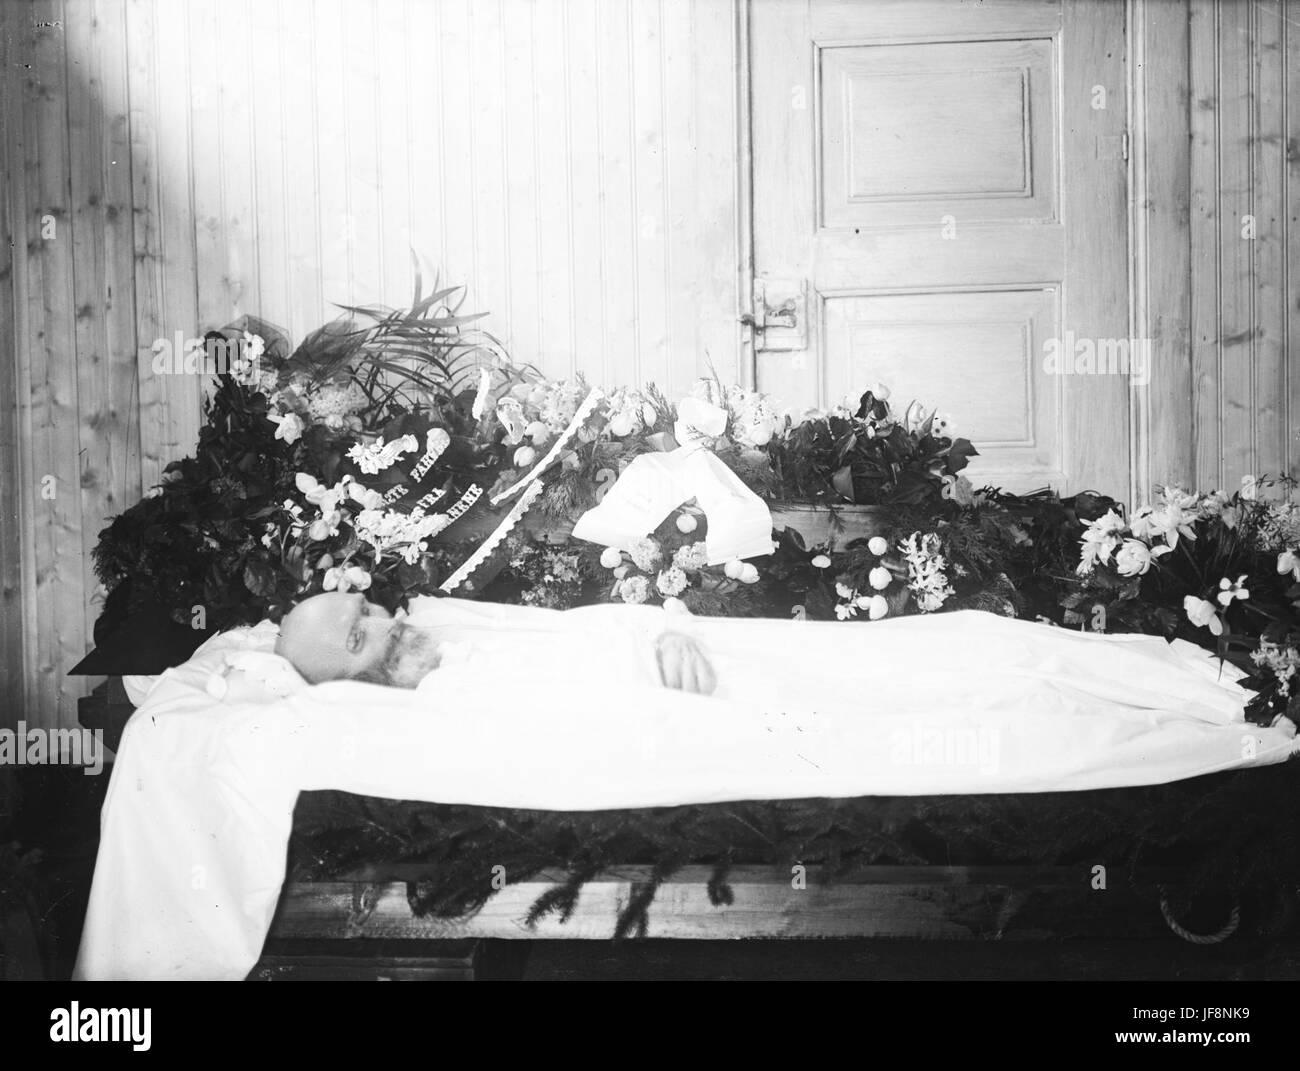 Post mortem portrait, ca 1910-1930 32755297693 o - Stock Image